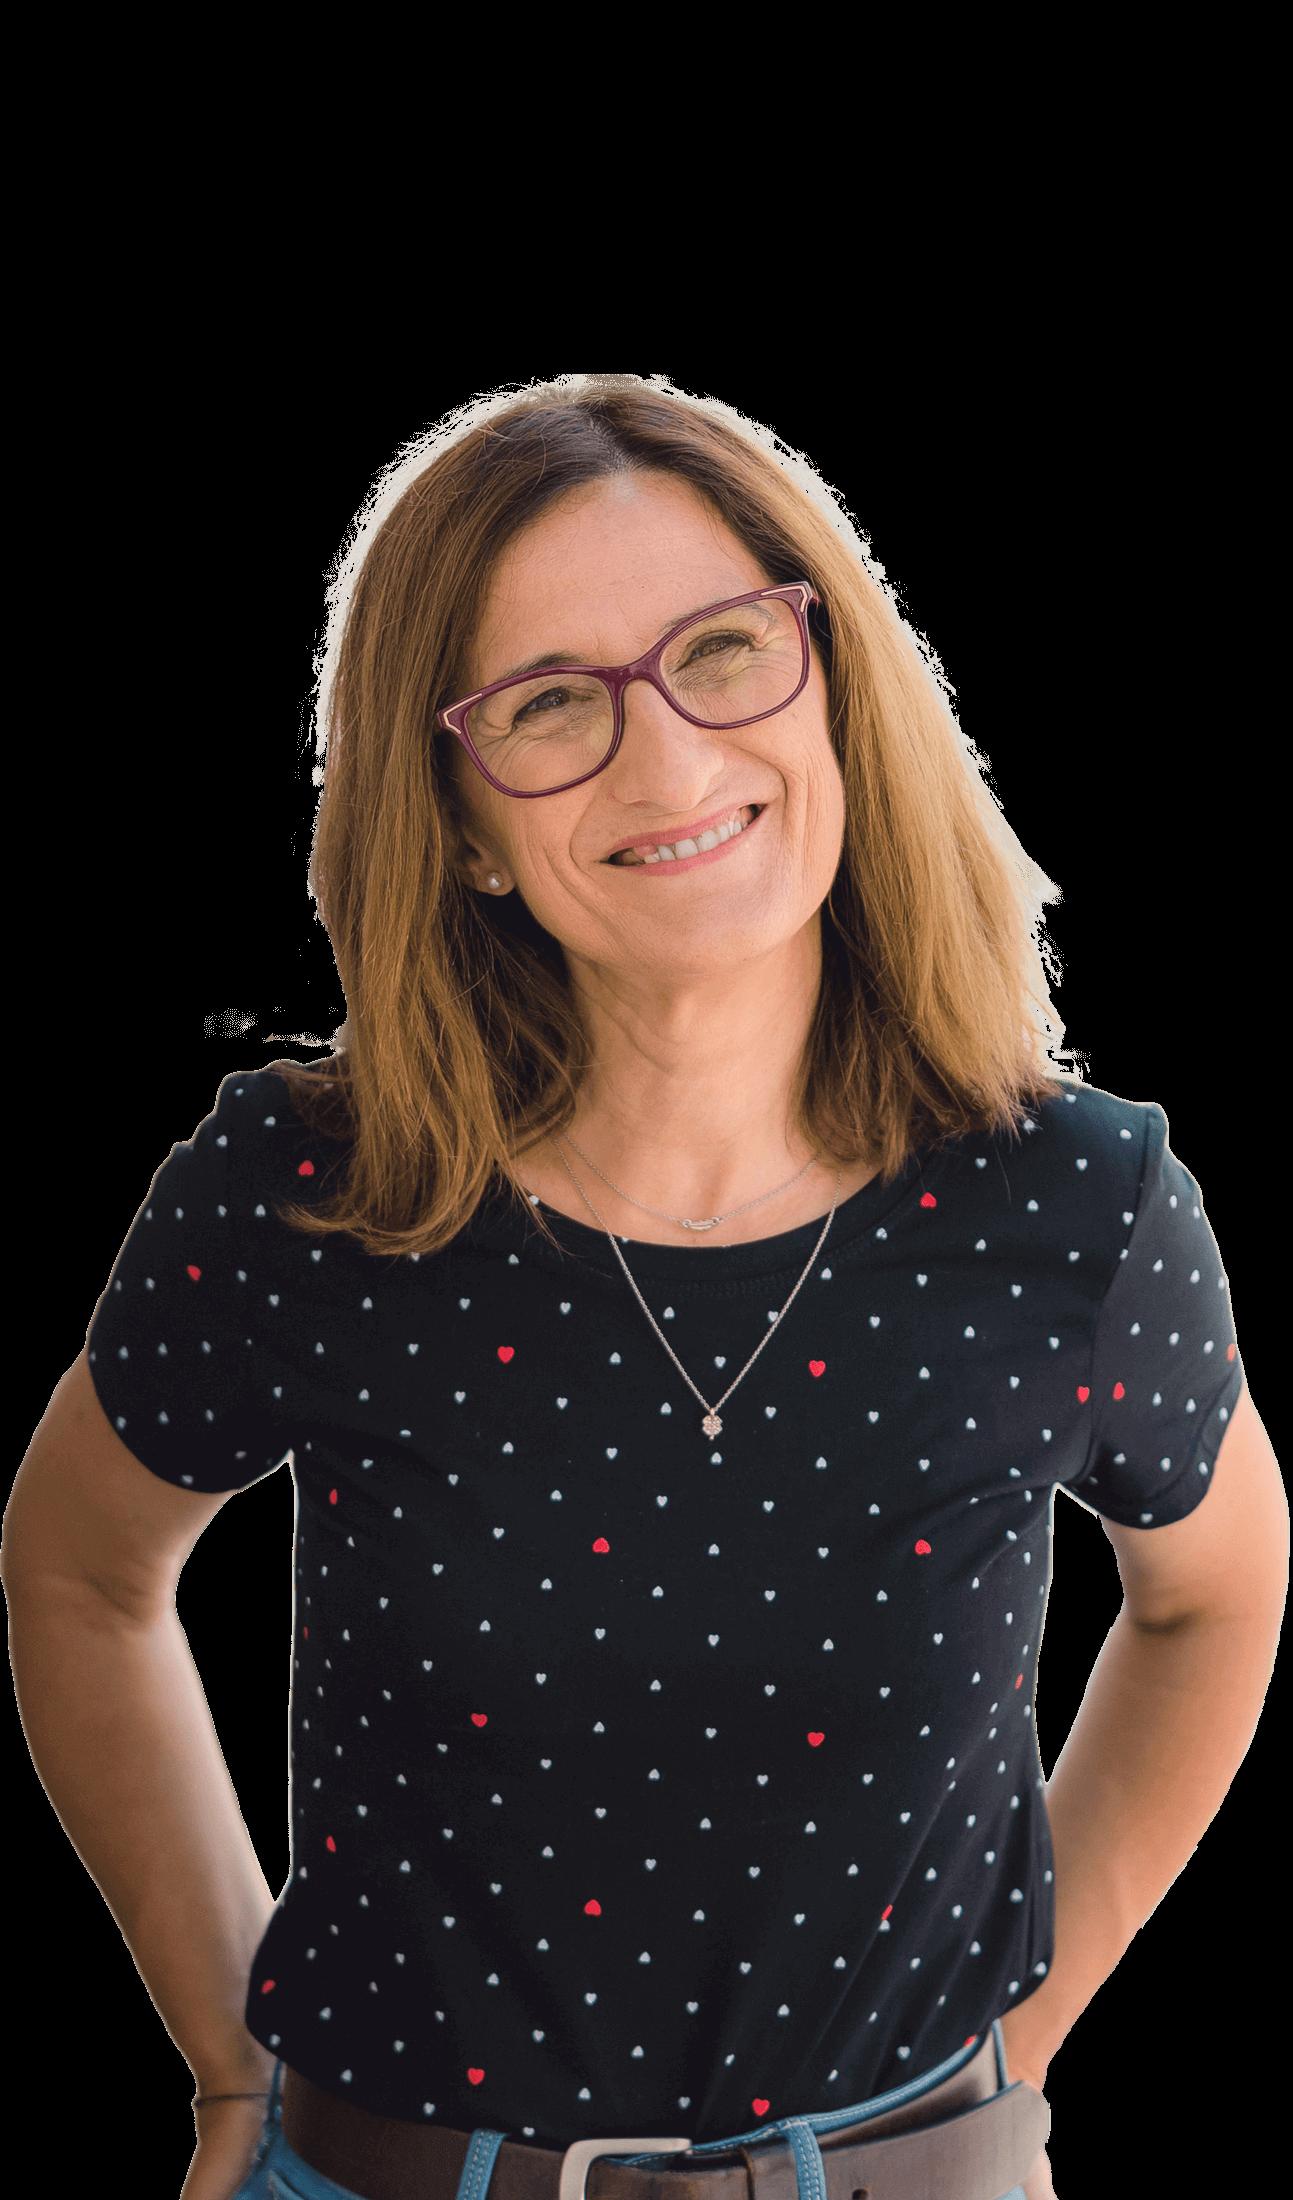 Marta Leal